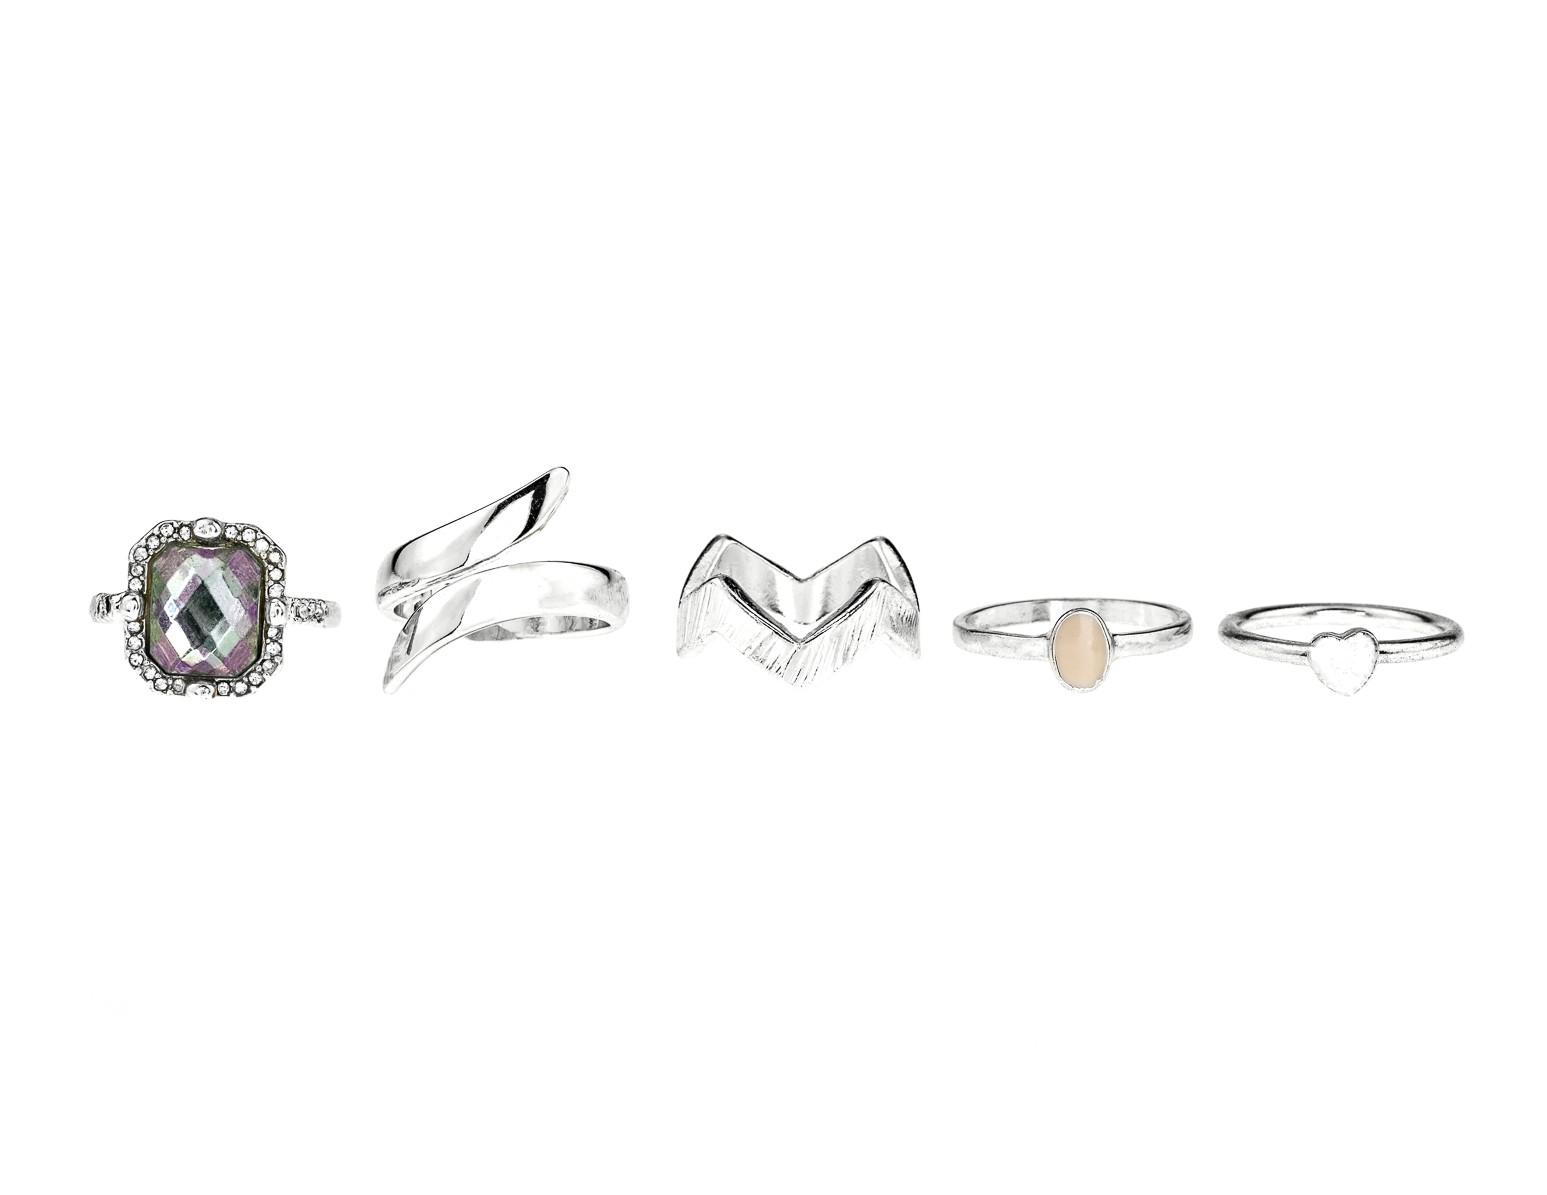 Gemstone Midi rings -set of 6